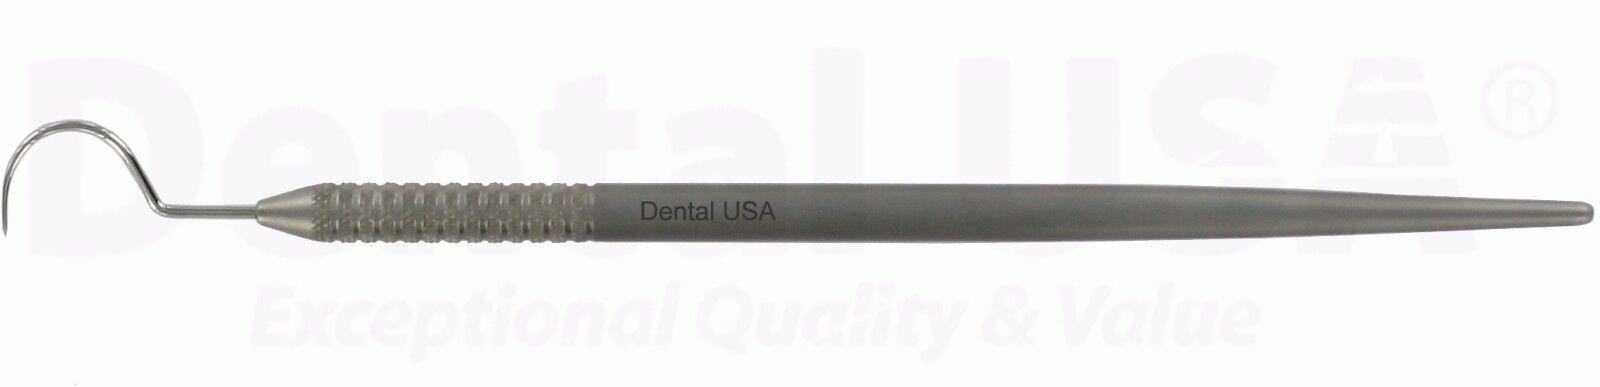 Dental USA EXPLORER Mod 1012E Plata 440A Acero Inoxidable Exp Exp Exp 54 6EZ conjunto de 10 a81ba5